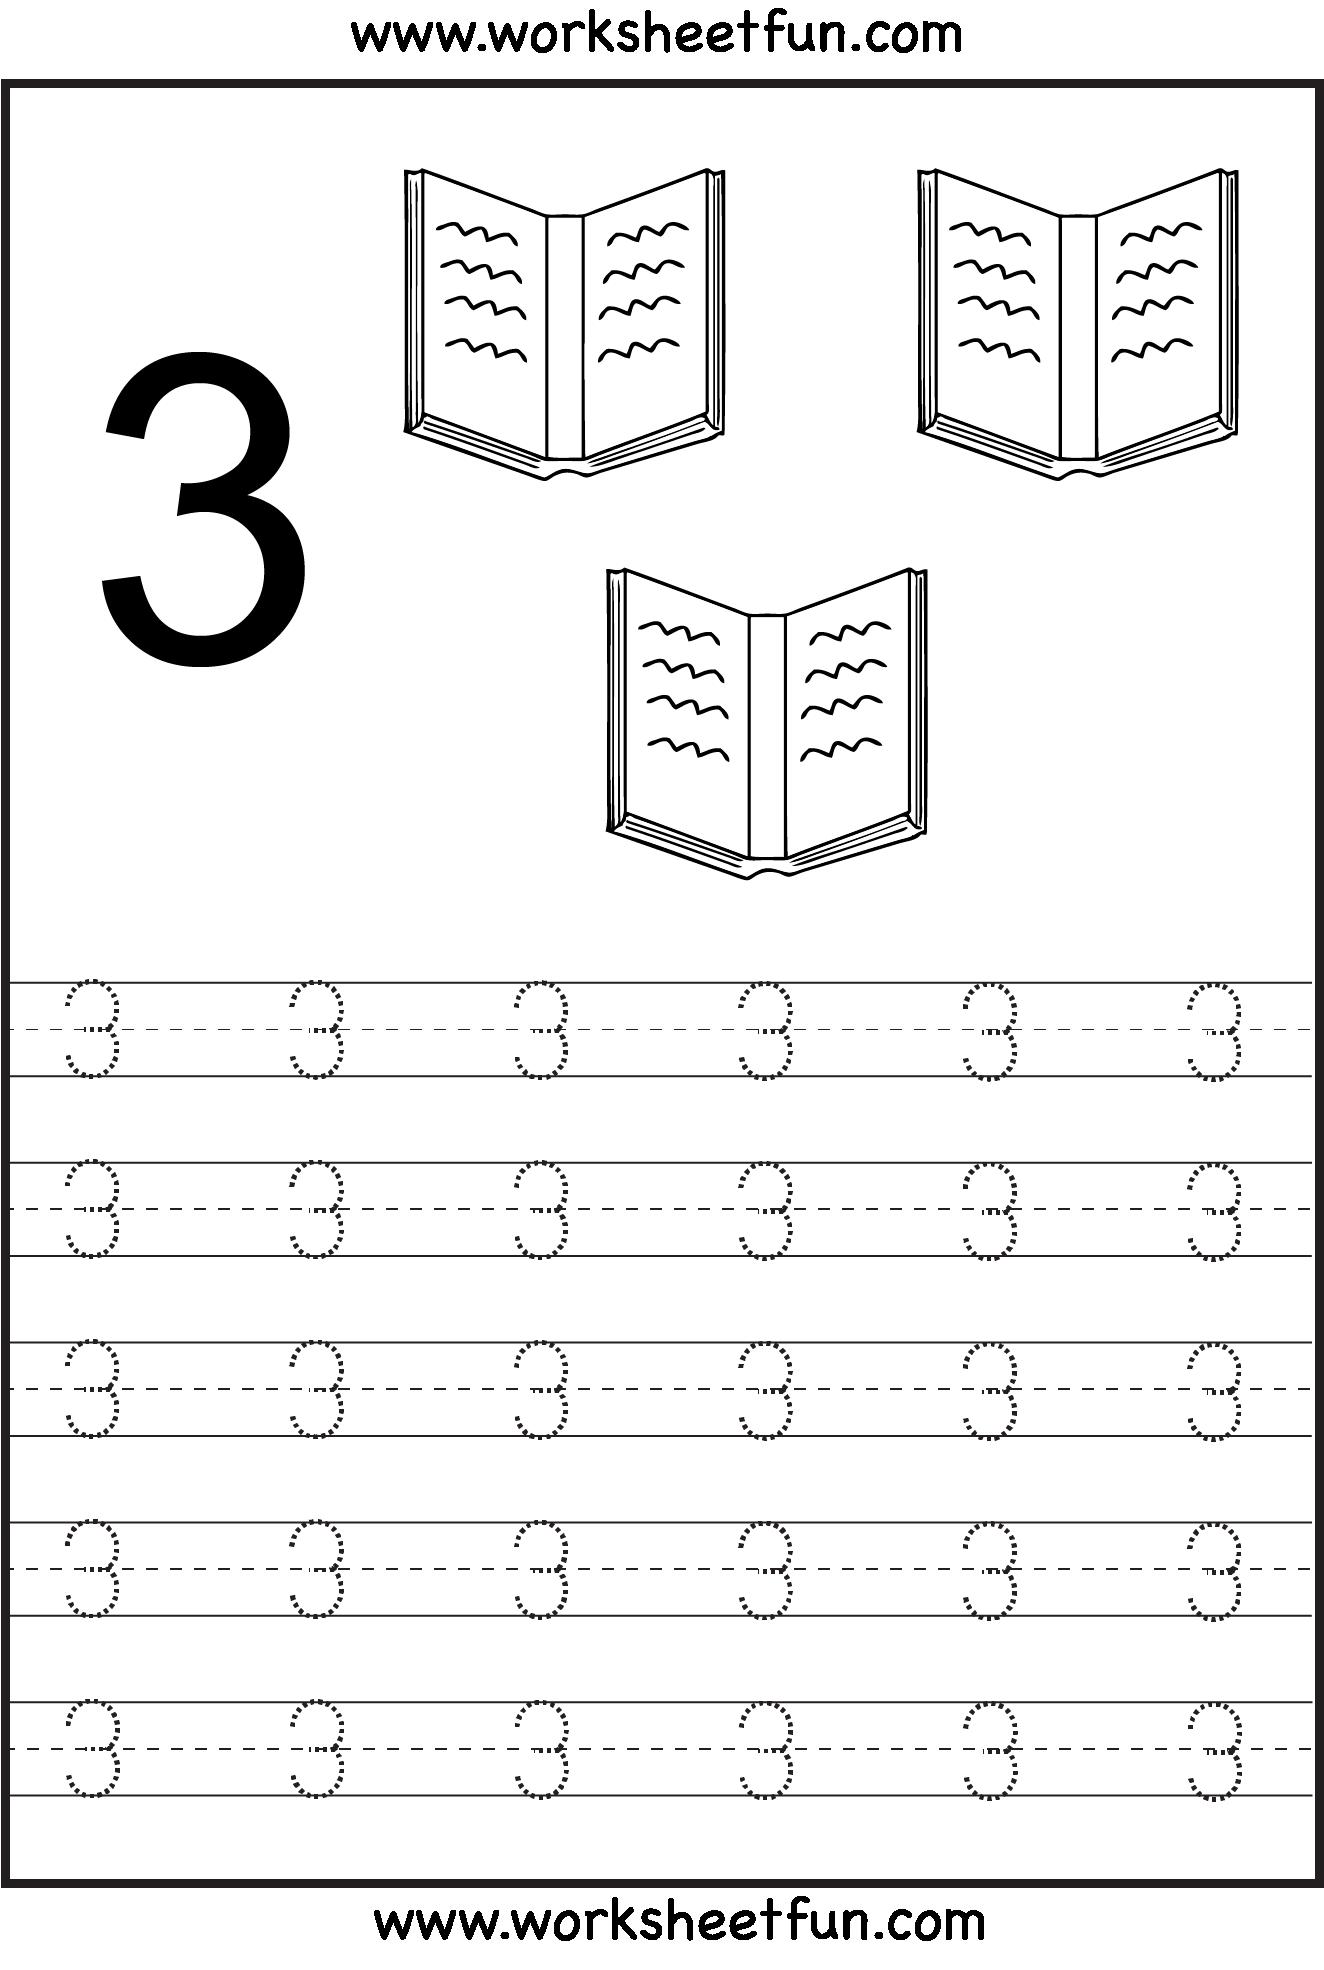 Preschool Worksheets Number 3 The Best Worksheets Image Collection